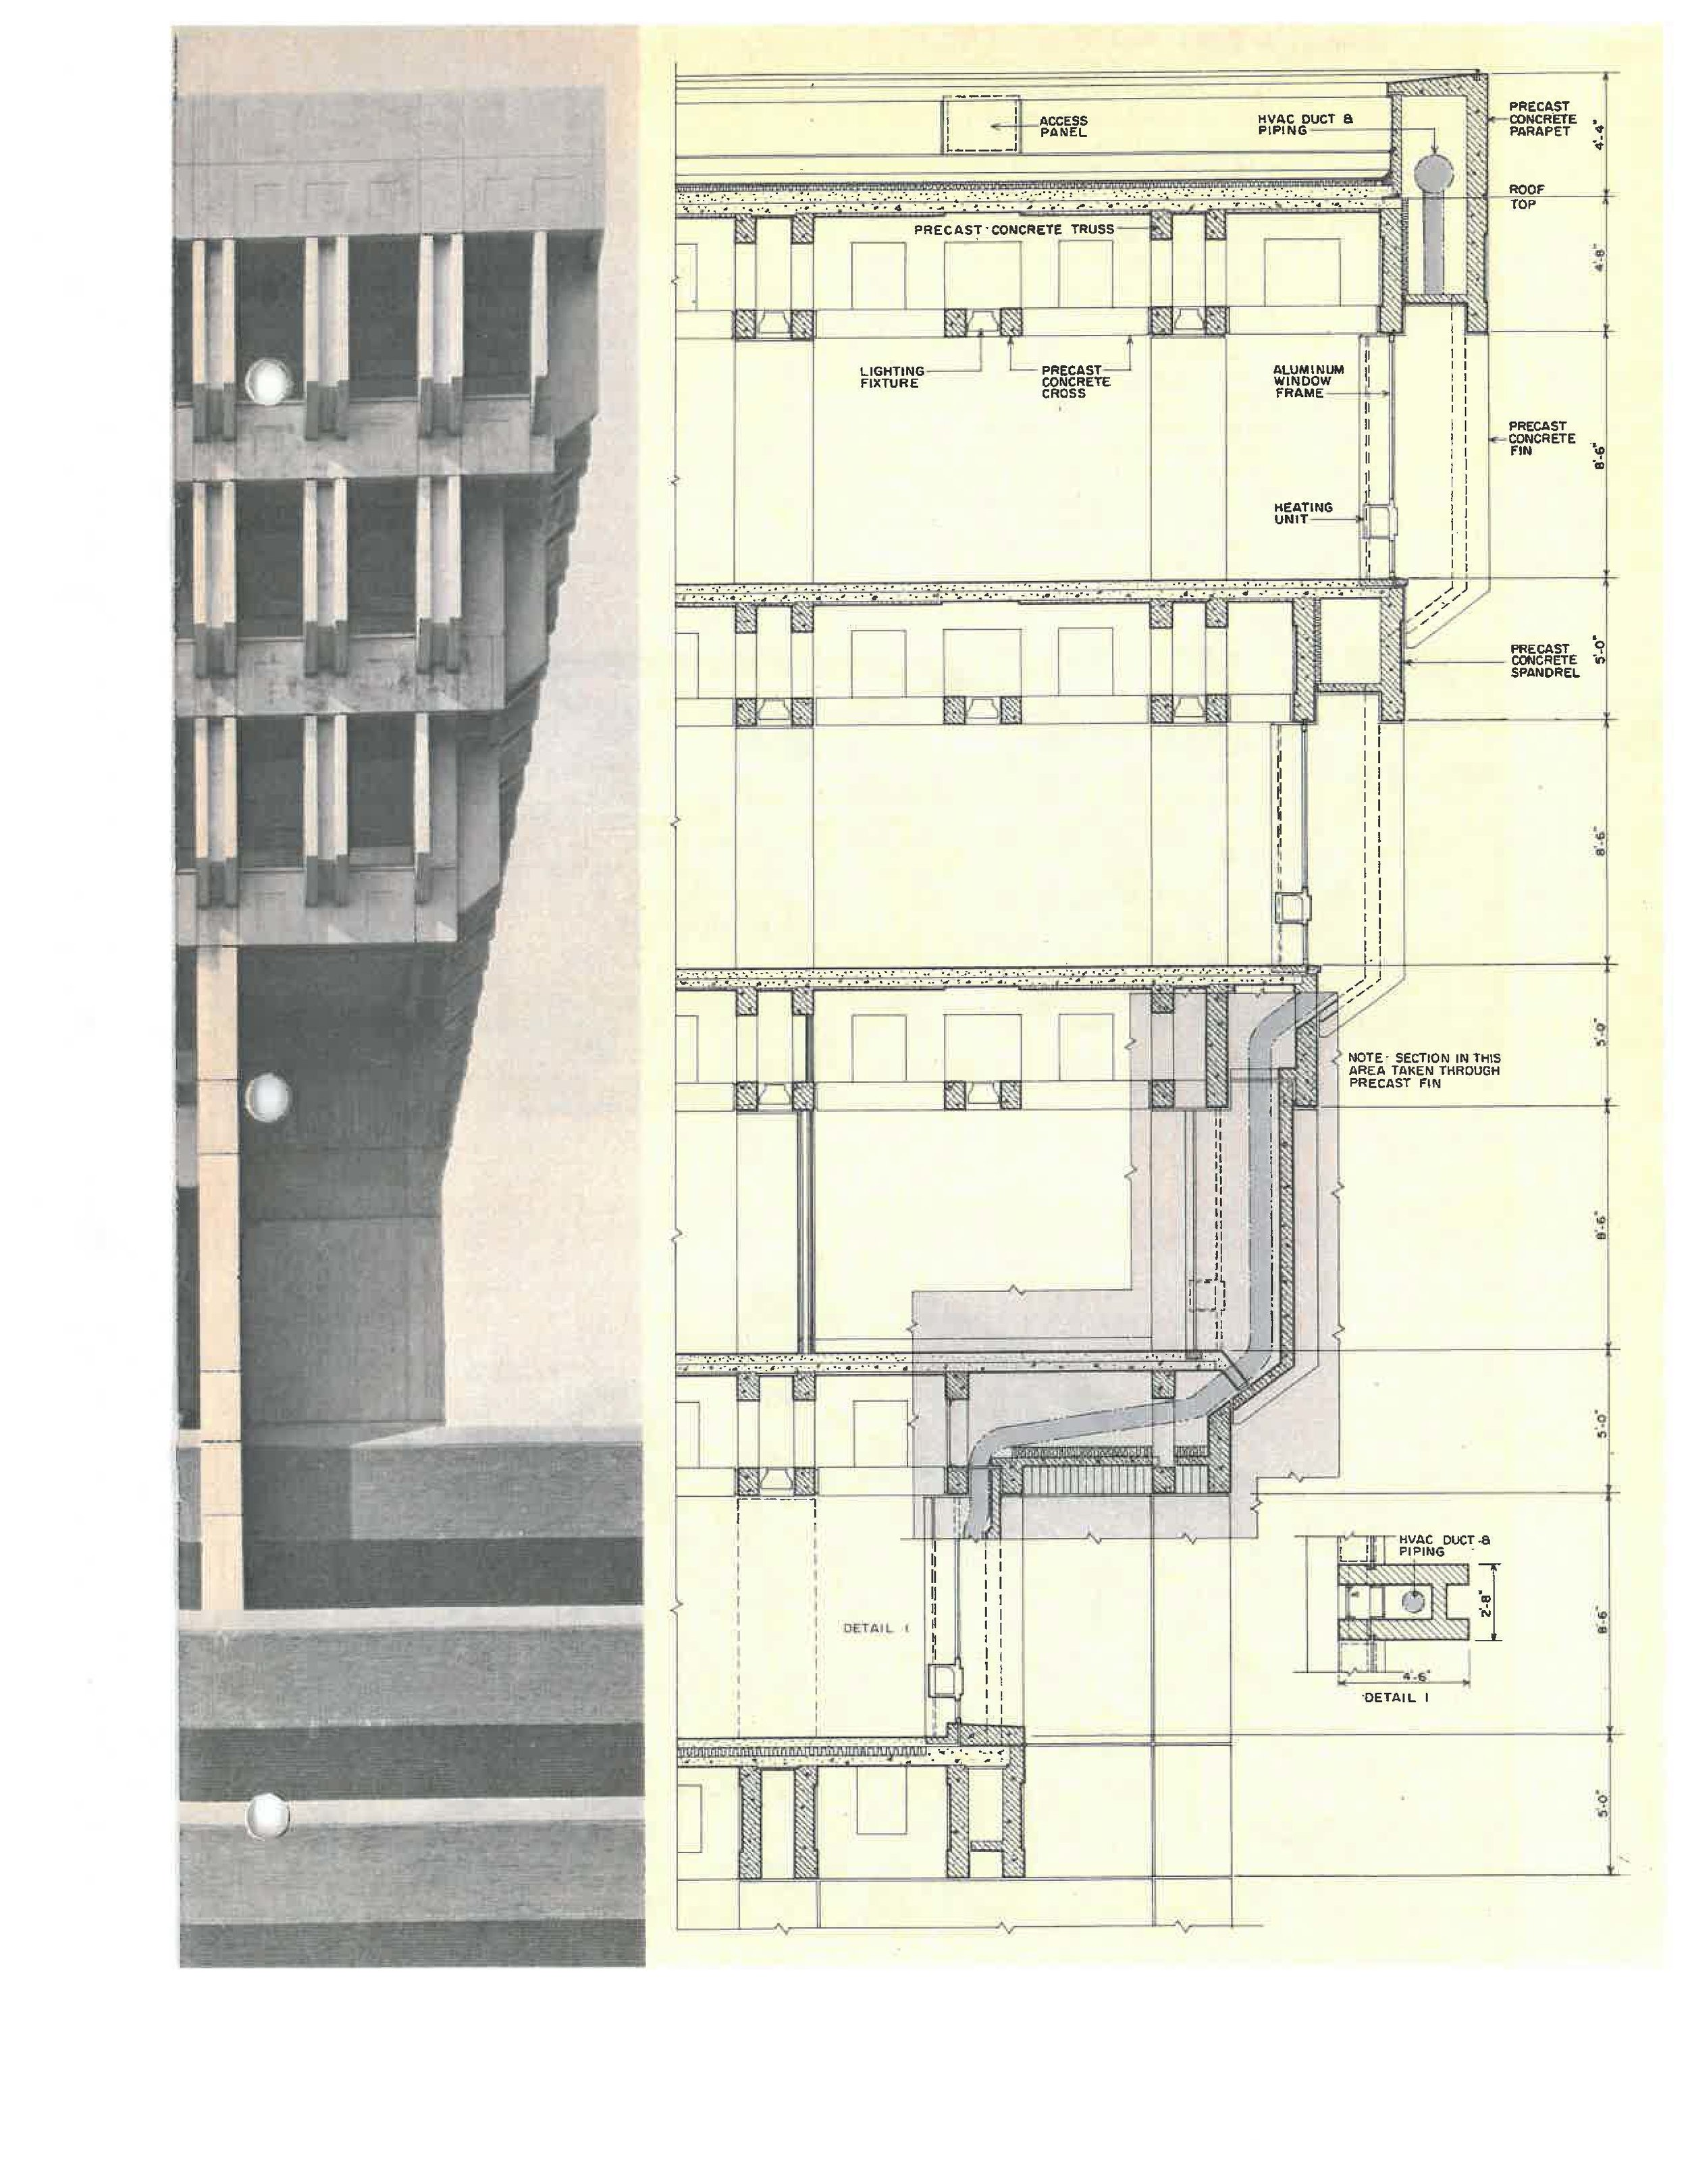 City_Hall_Page_12.jpg